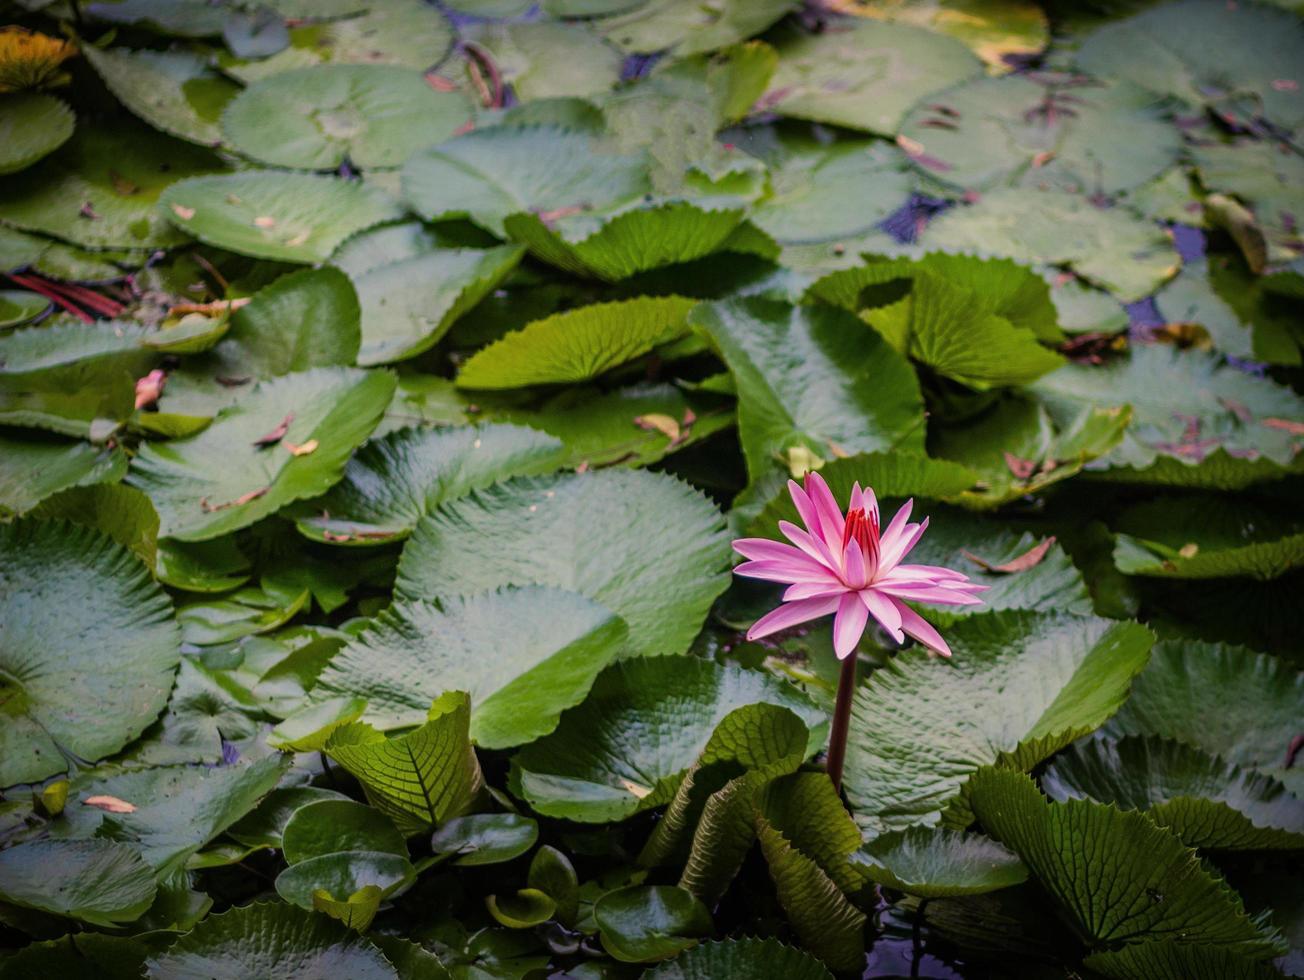 rosa lotusblomma under dagtid foto